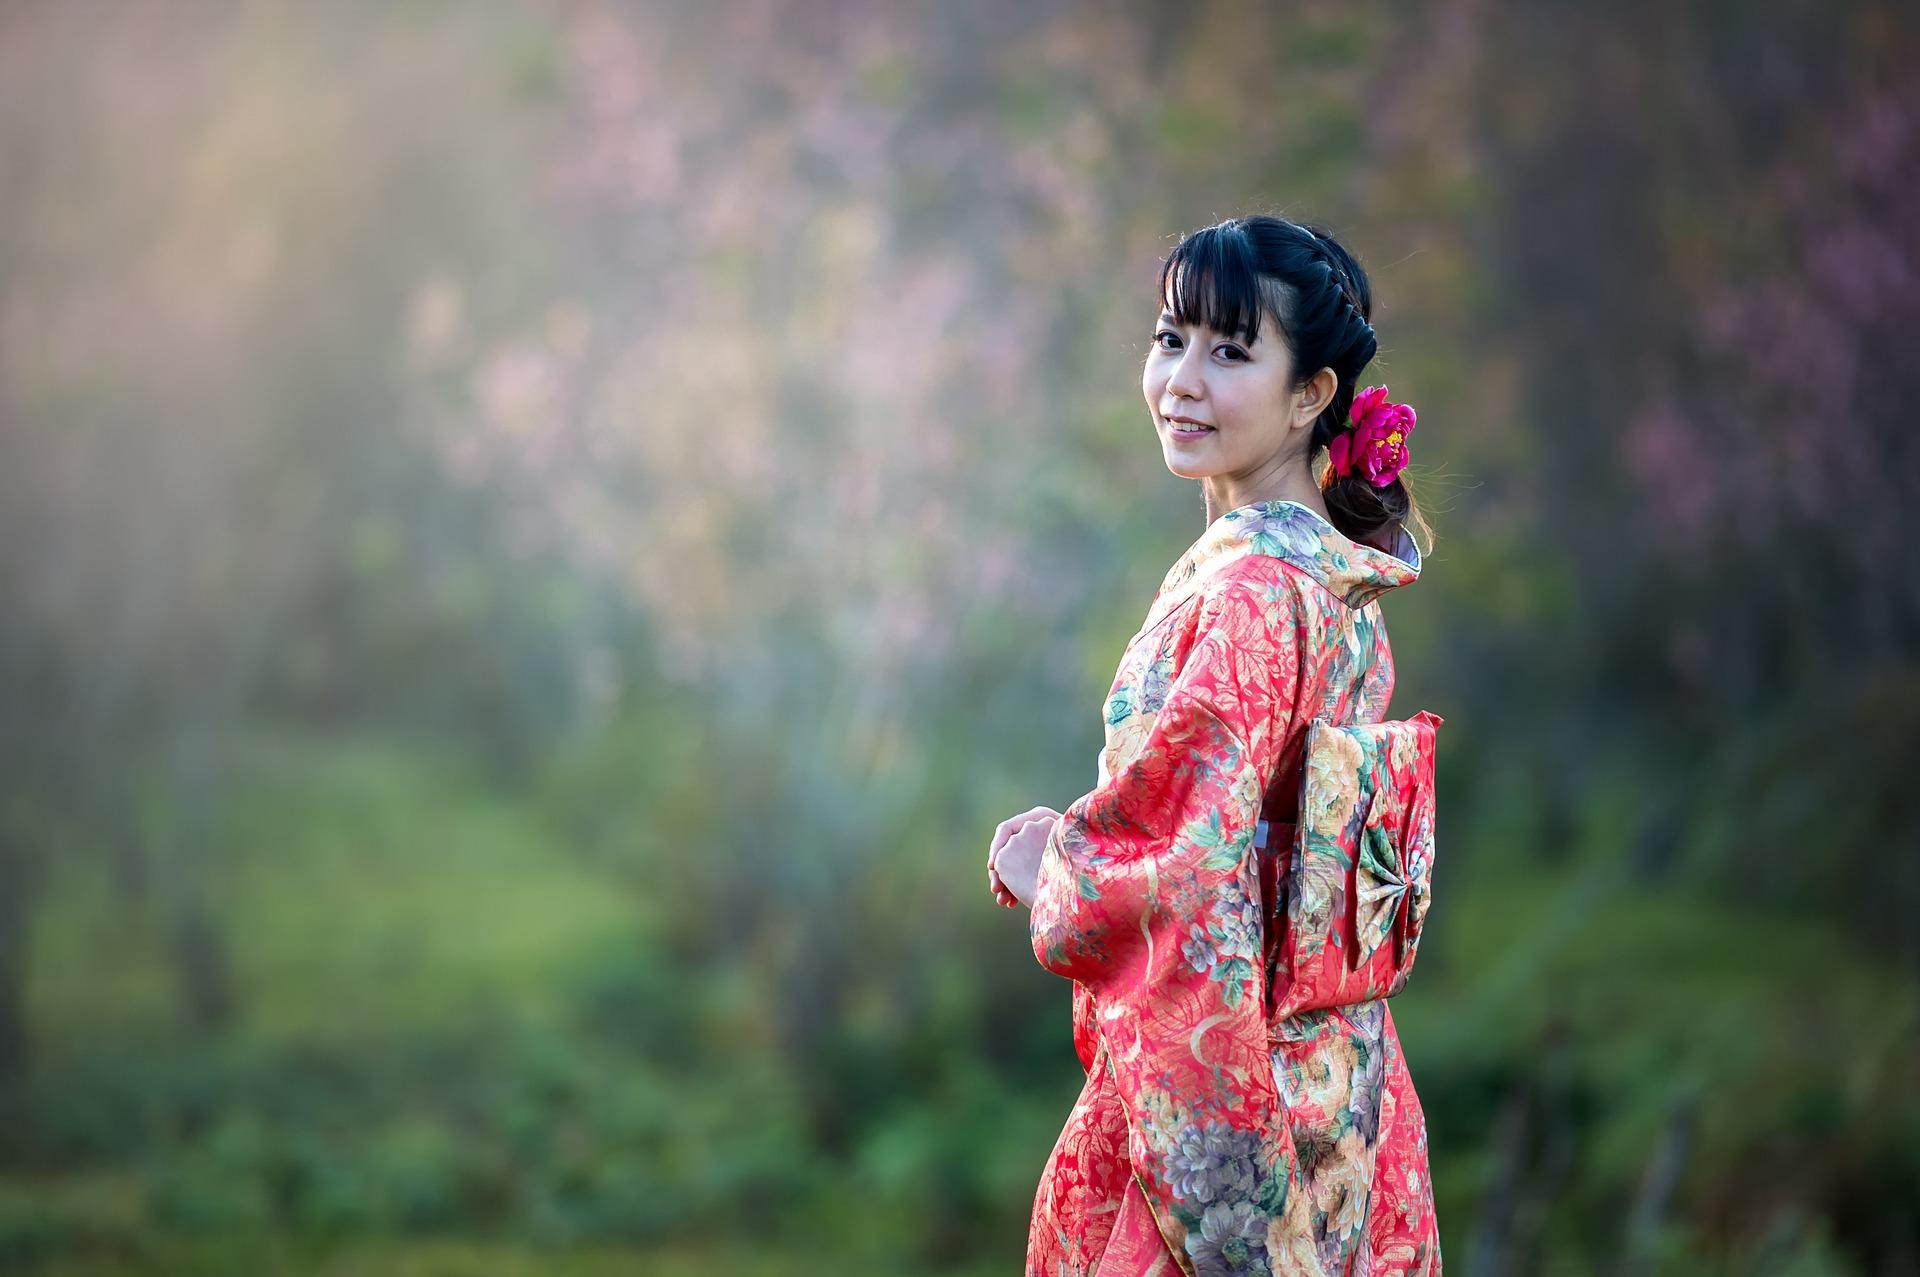 images/geisha1.jpg